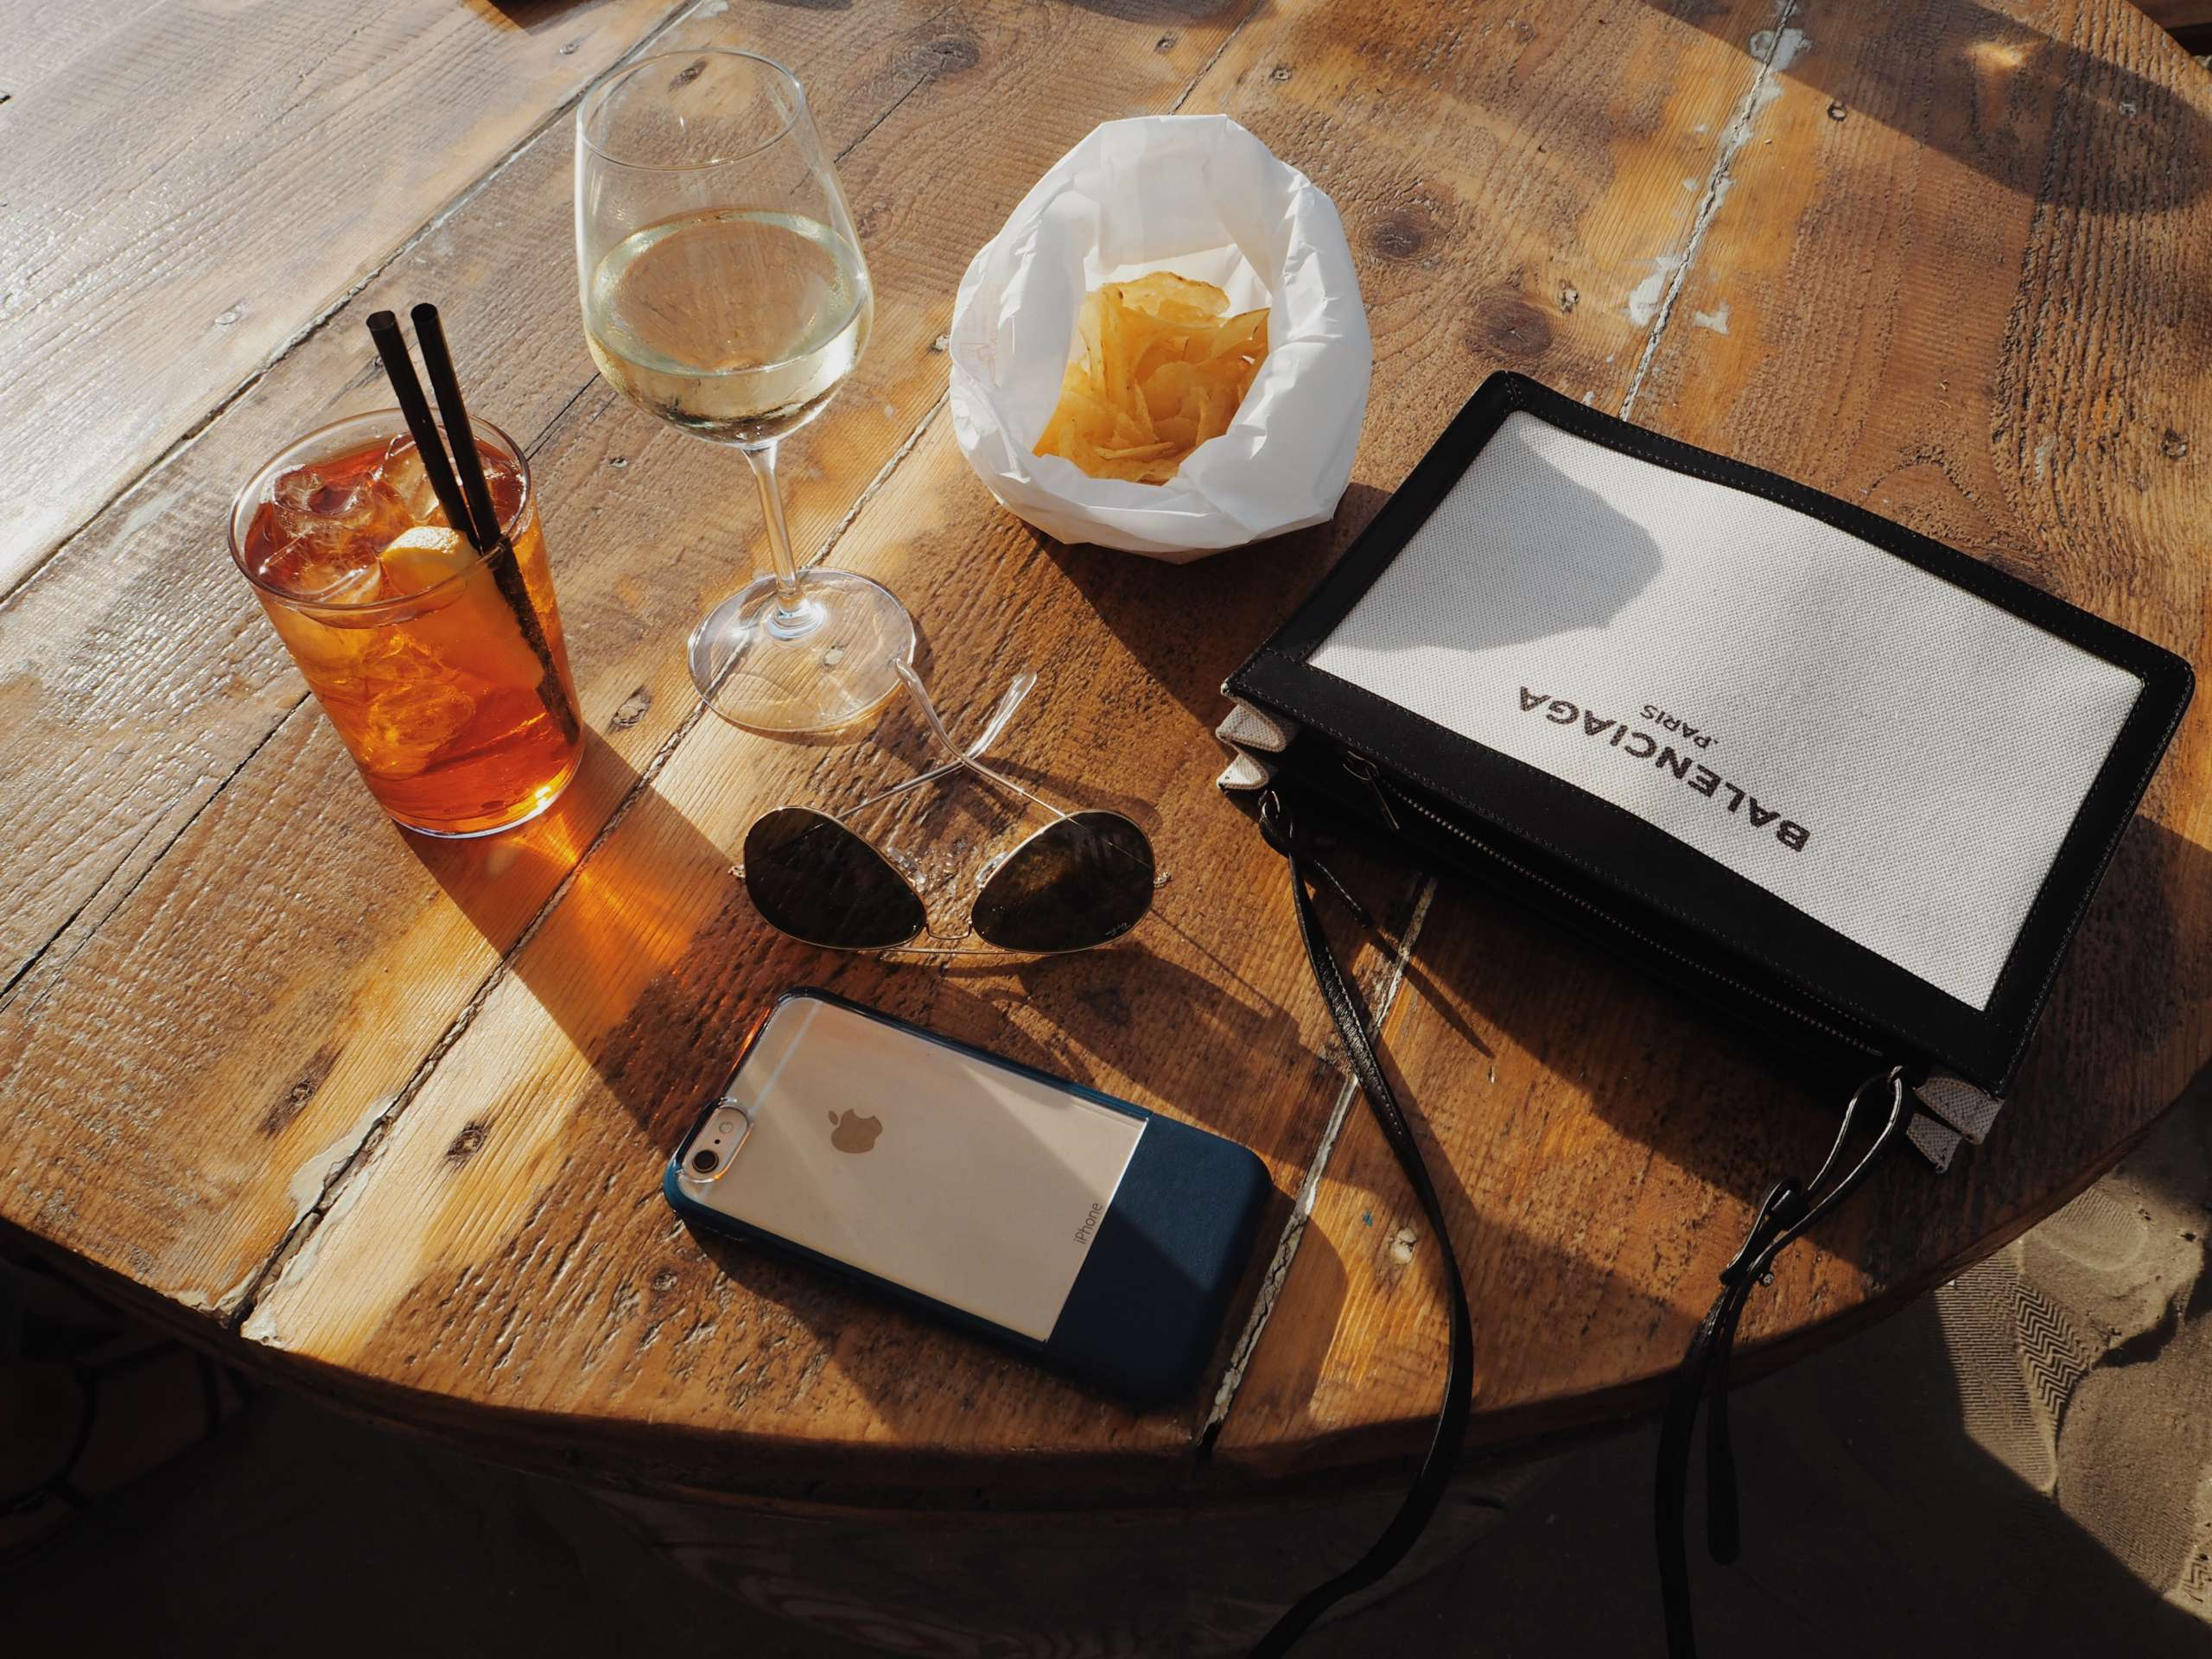 baretto-marina-romea-beach-club-hoodie-Italy-laura-gravestock- nicole-vienna-onepiece-otterbox-phone-case-summer-balenciaga-rayban